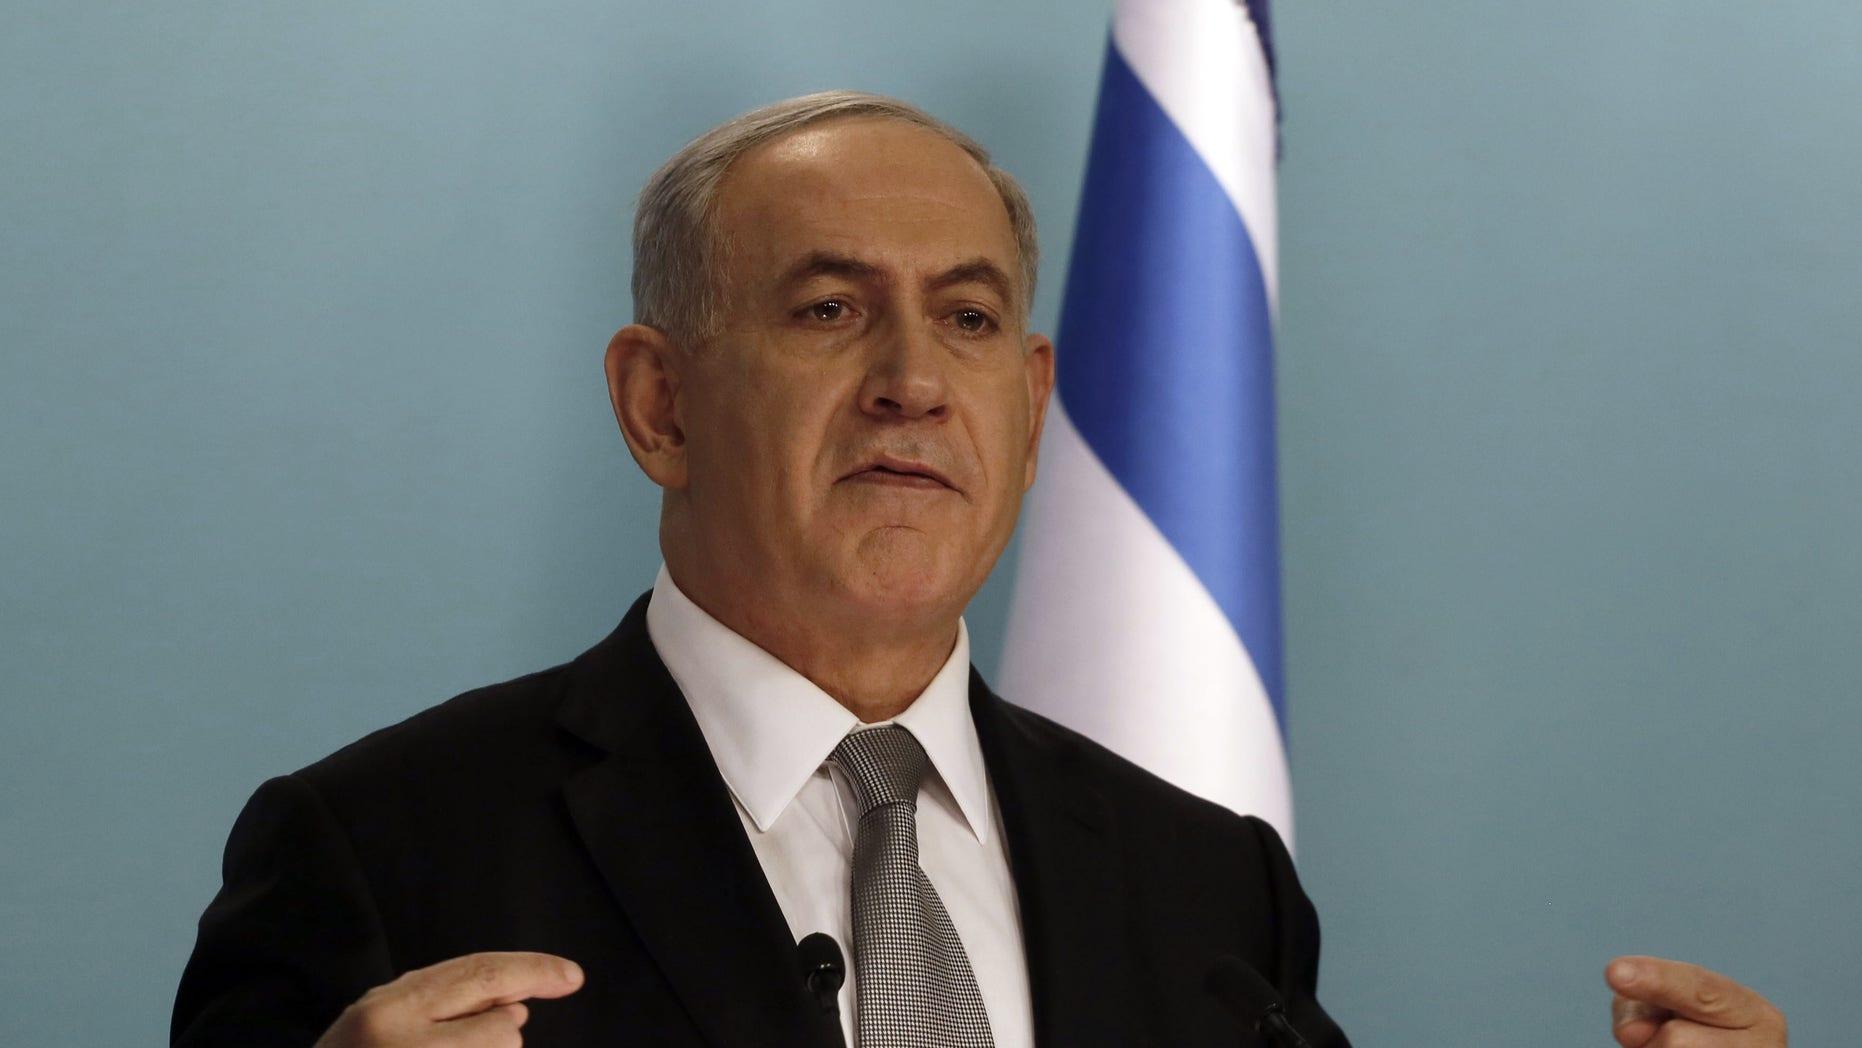 Dec. 2, 2014: Israeli Prime Minister Benjamin Netanyahu attends a press conference in Jerusalem.